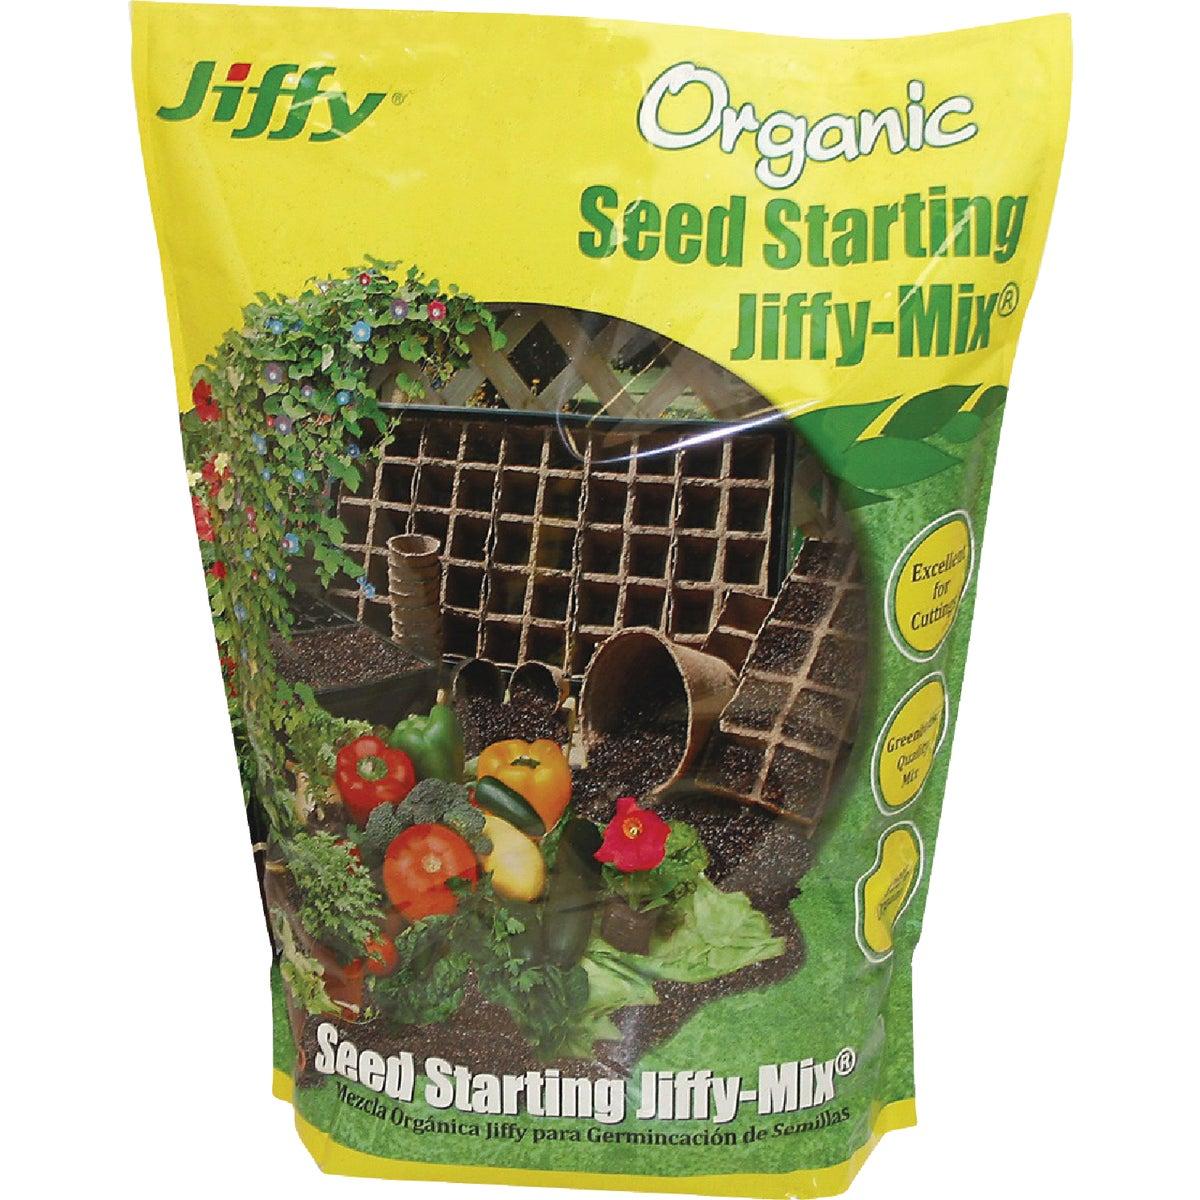 16Qt Org Seed Start Mix